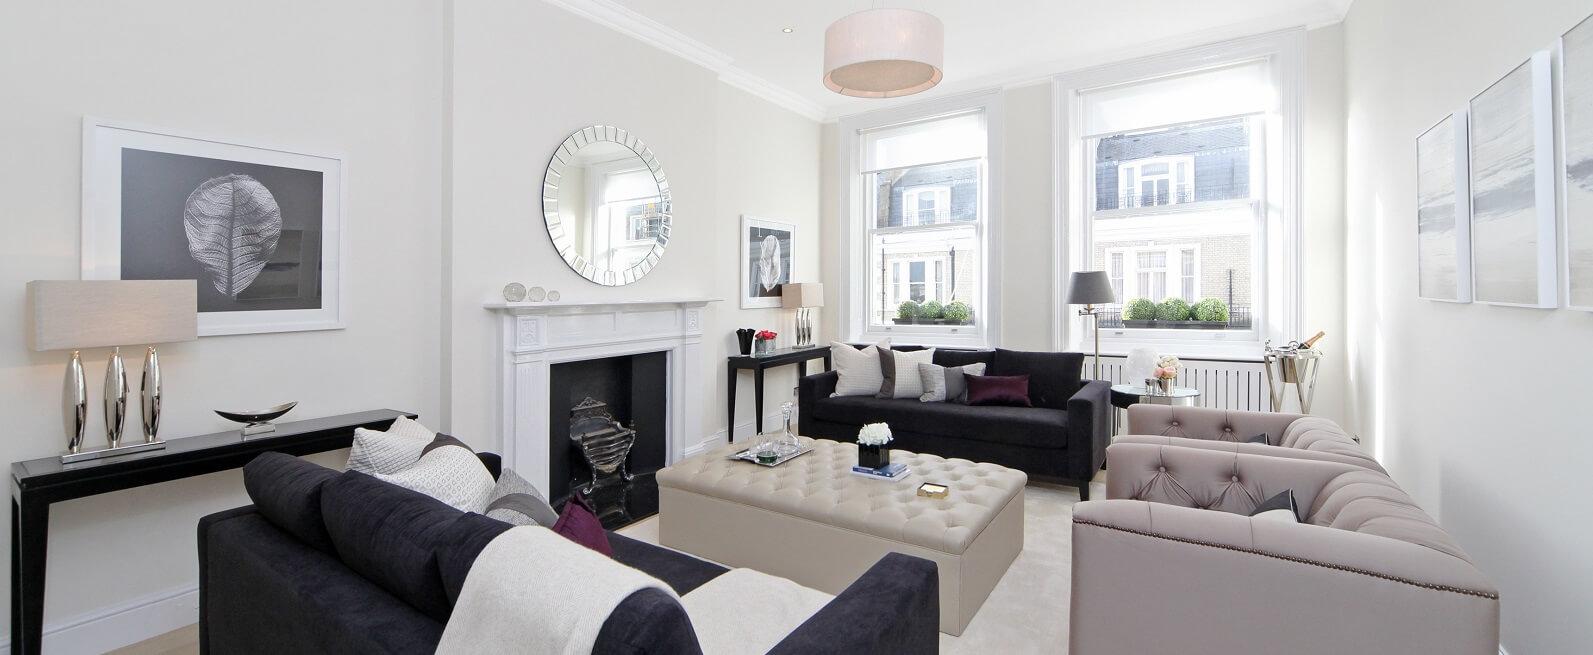 Luxury Interior Design in London | Interior Architecture | Hampstead